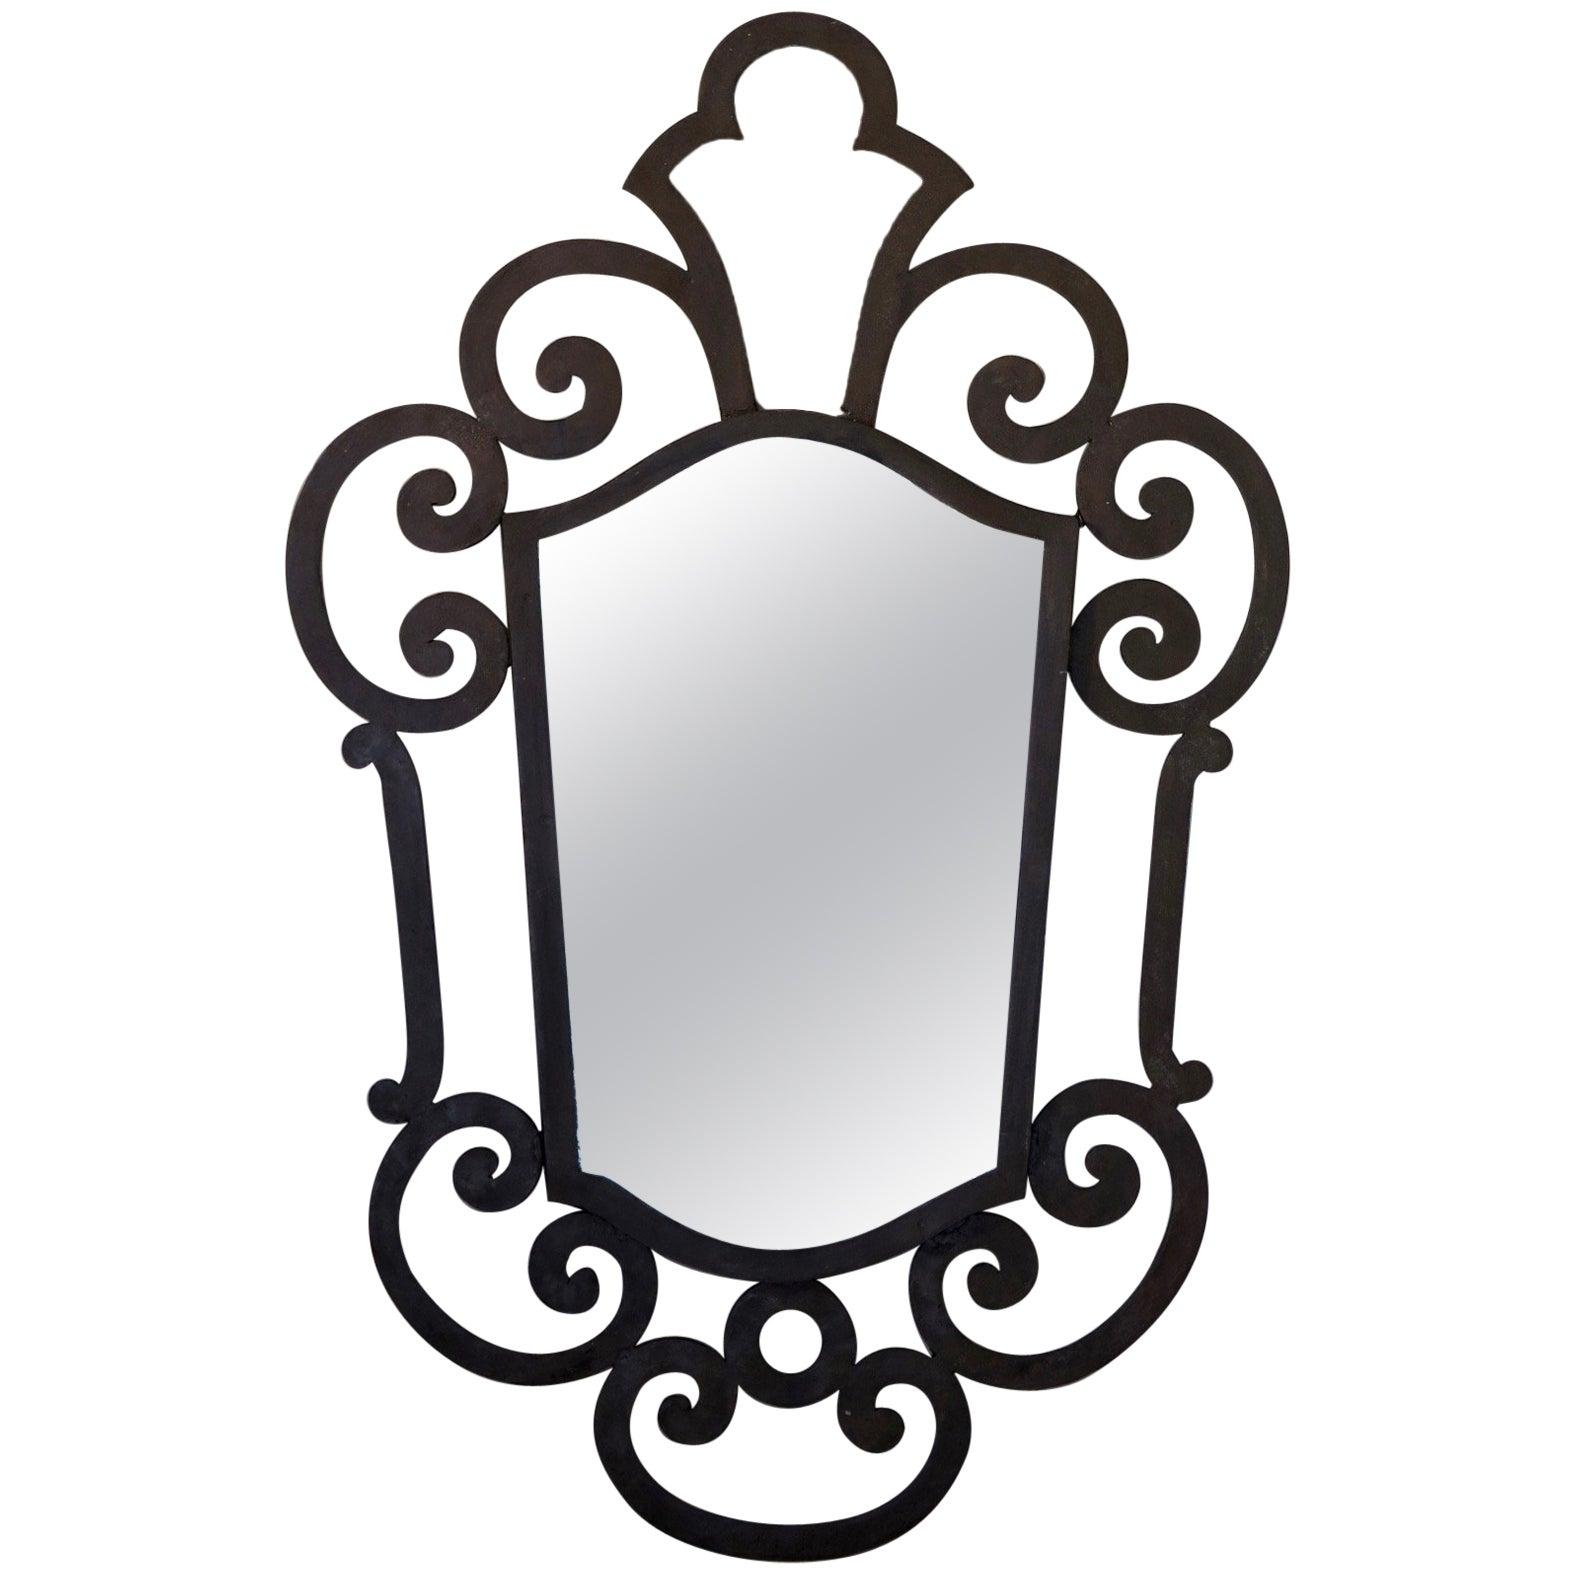 French 1940s Wrought Iron Art Deco Mirror